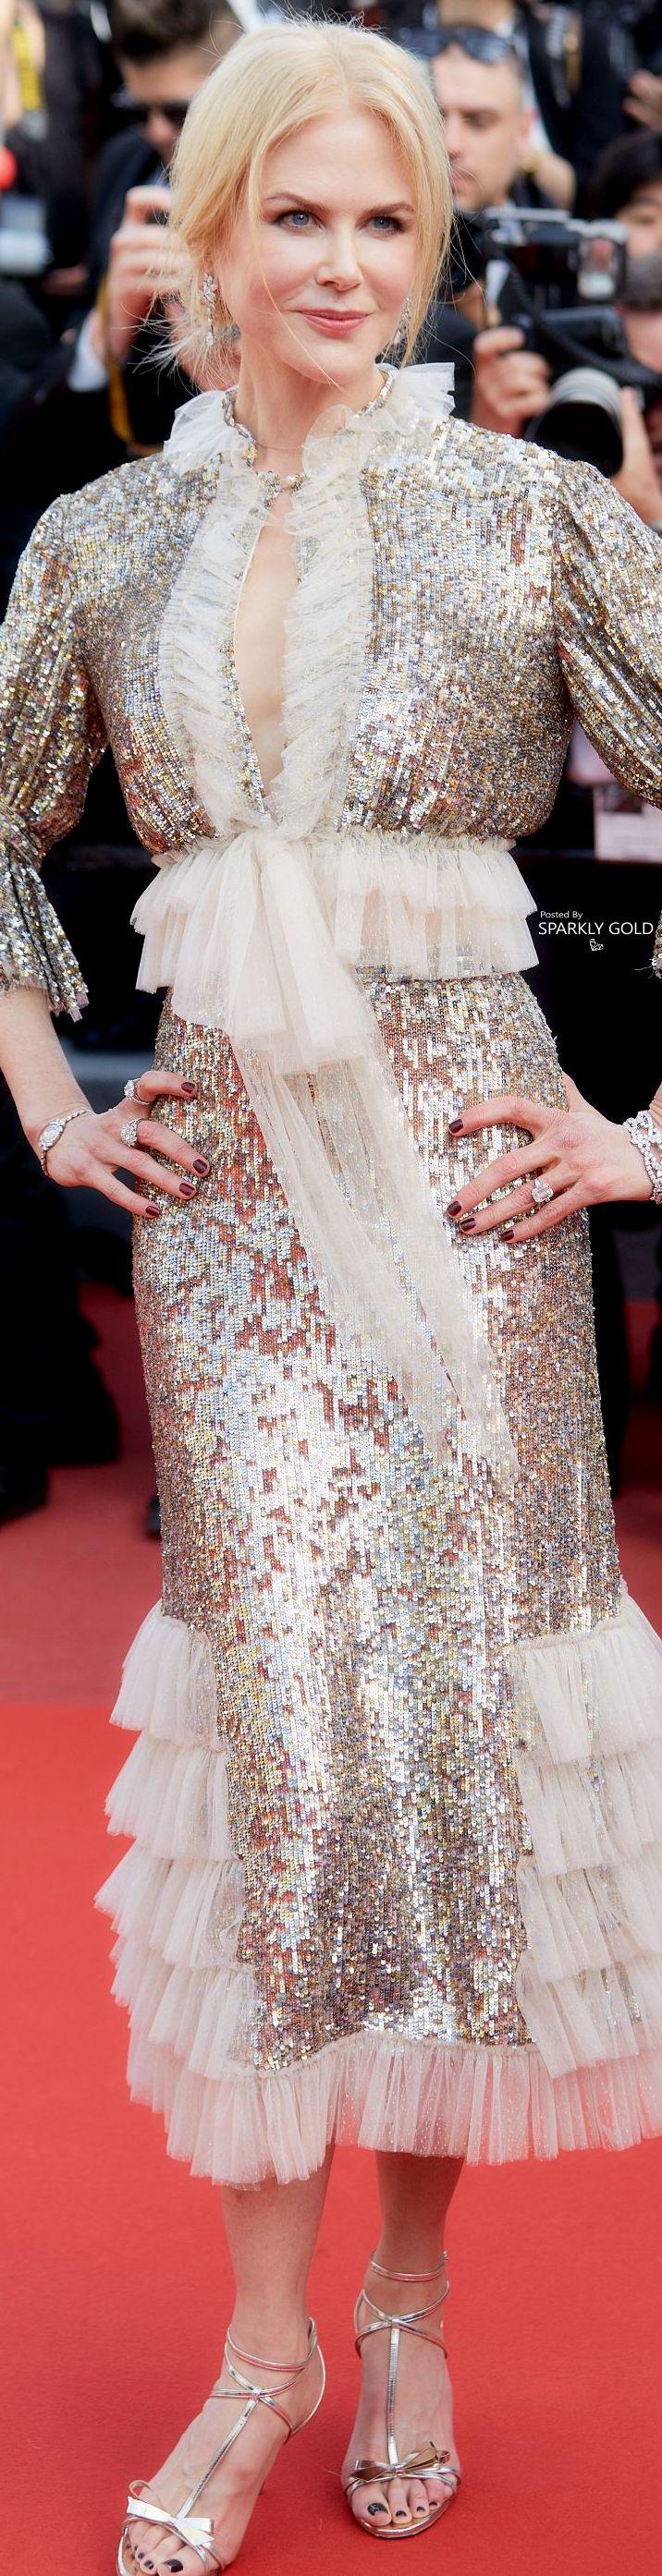 Nicole Kidman/Cannes Film Festival 2017 (Rodarte